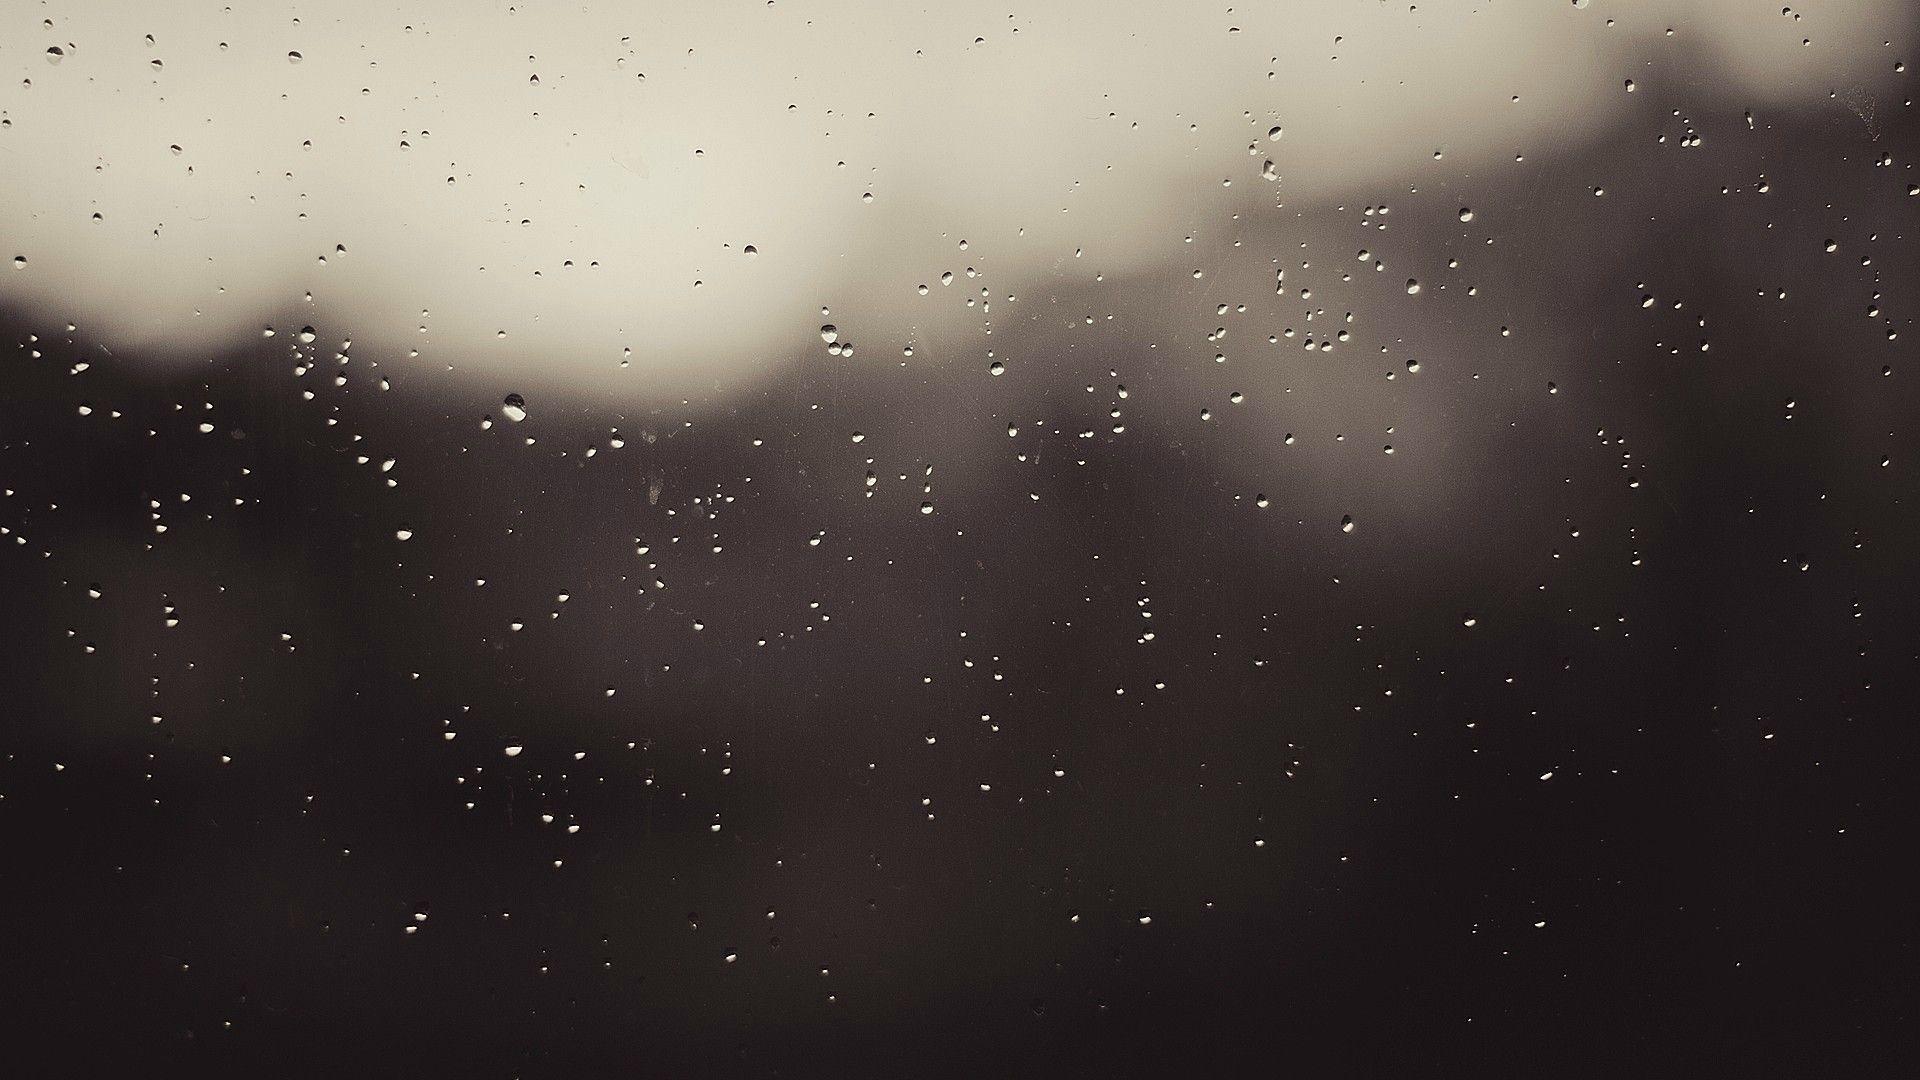 Raining Gifs Hipster Wallpaper Desktop Wallpapers Tumblr Weather Wallpaper